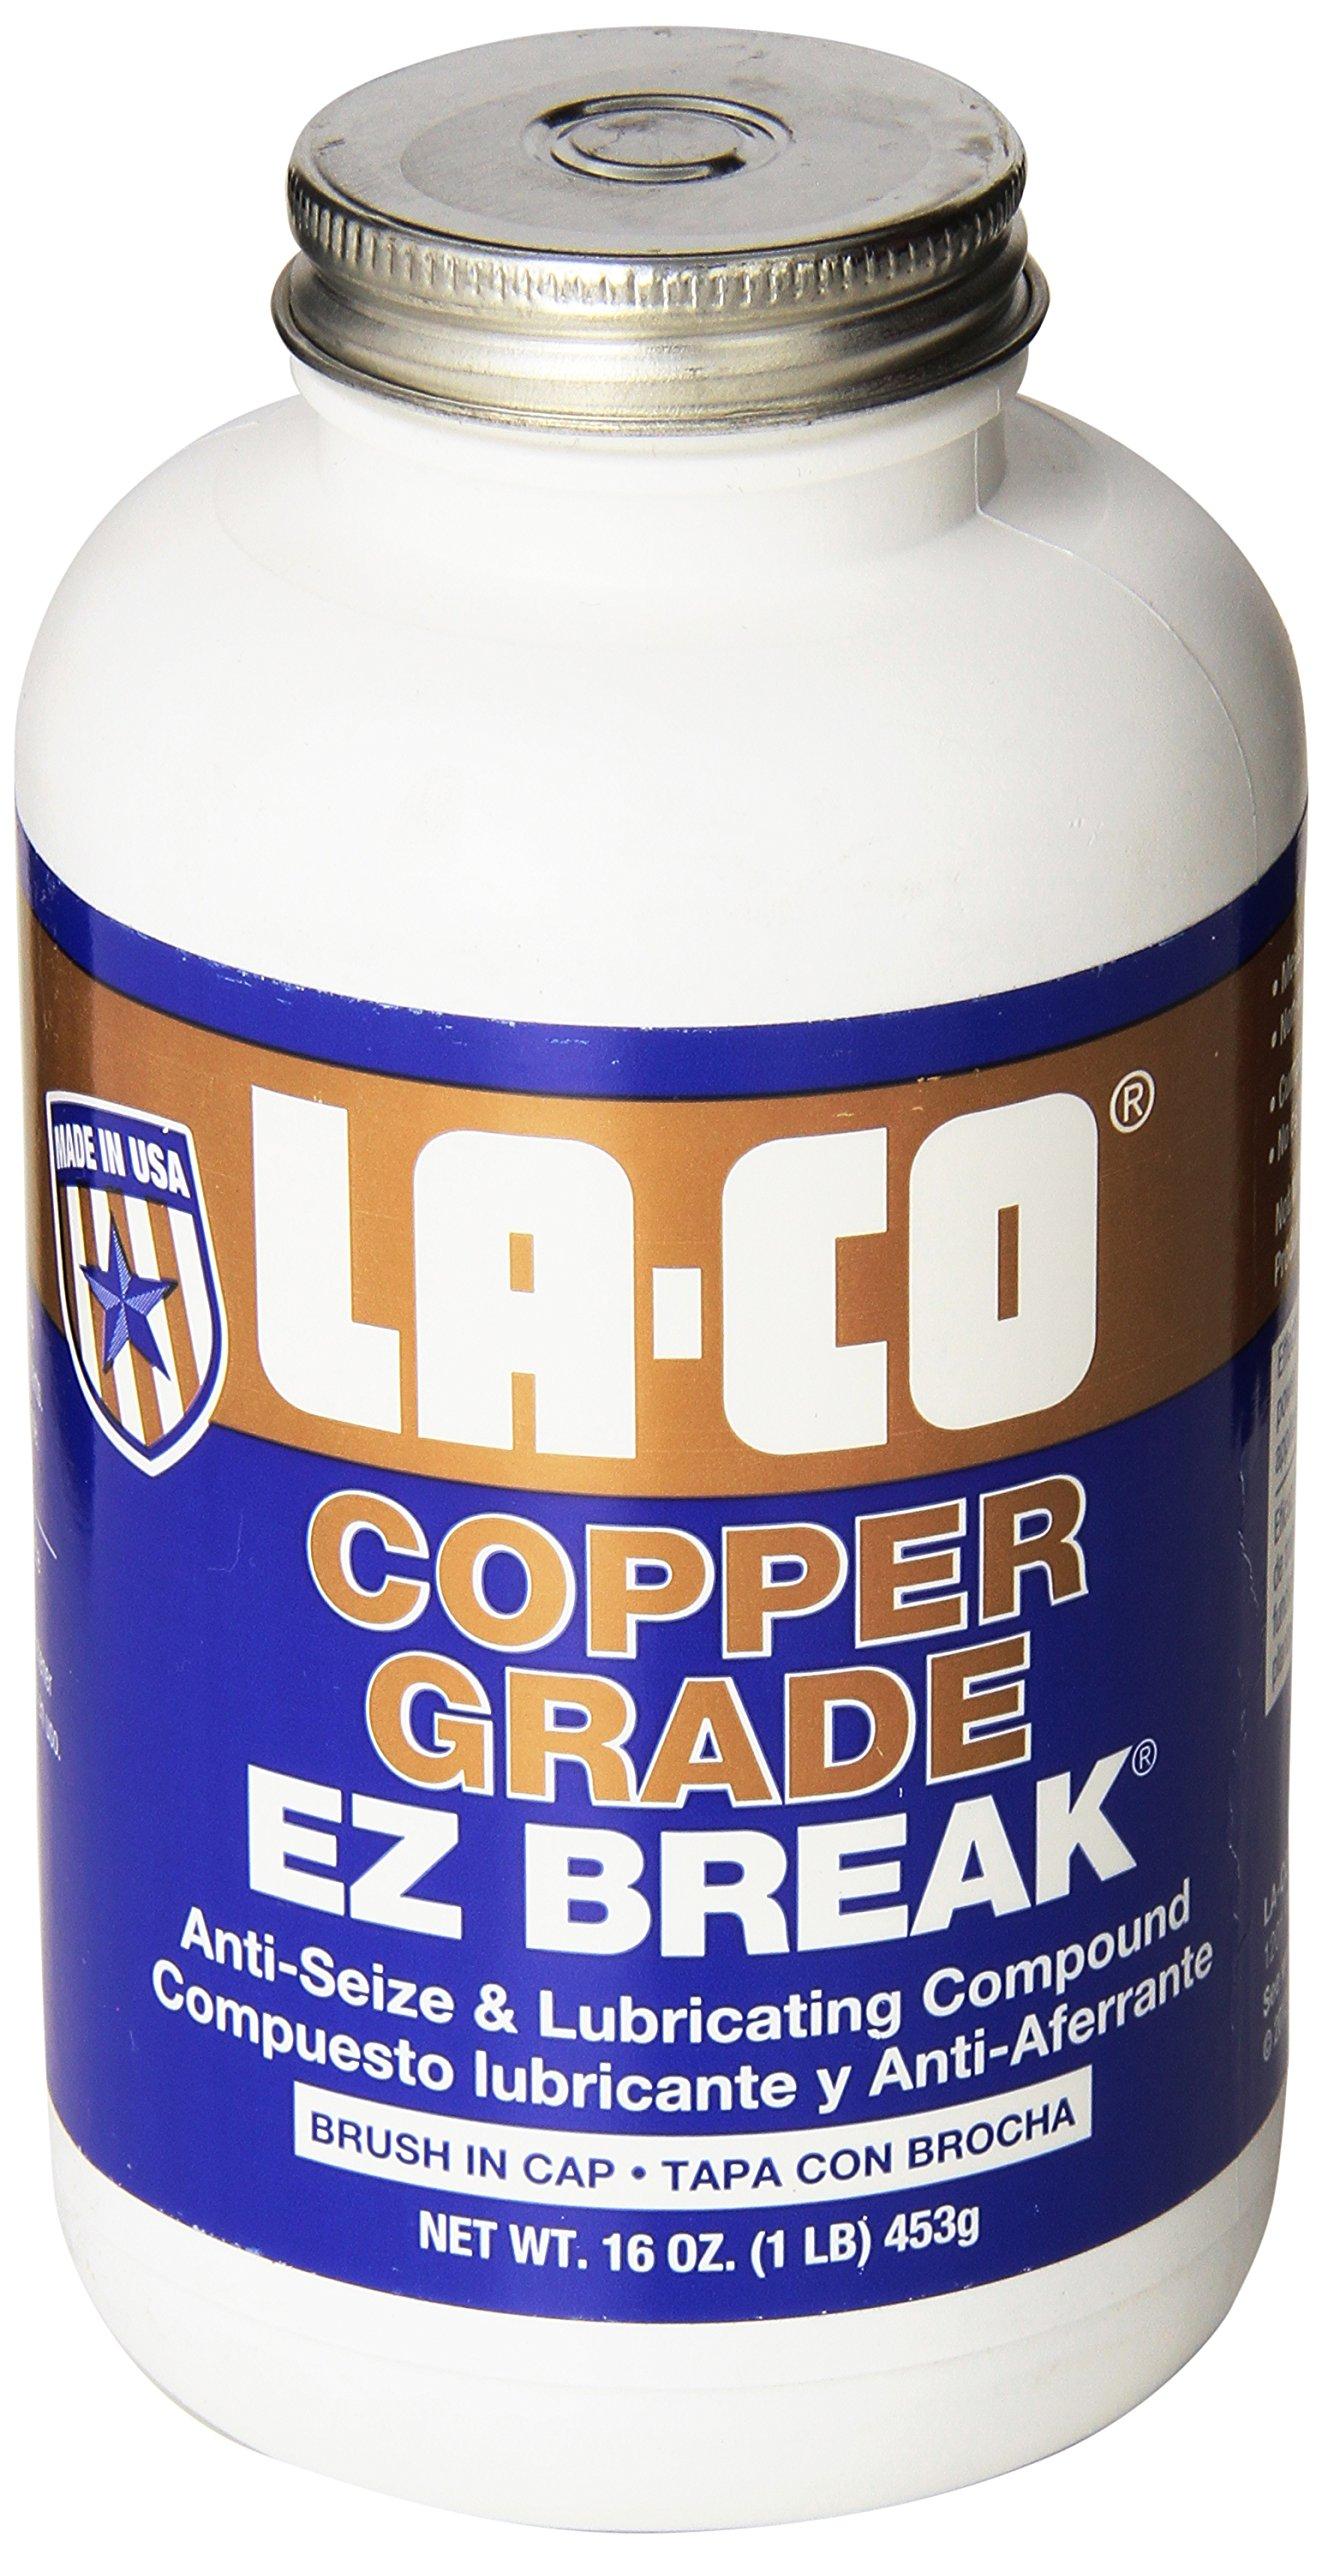 LA-CO EZ Break Copper Grade Antiseize Paste, 1800 Degree F Temperature, 16 oz Jar with Brush in Cap